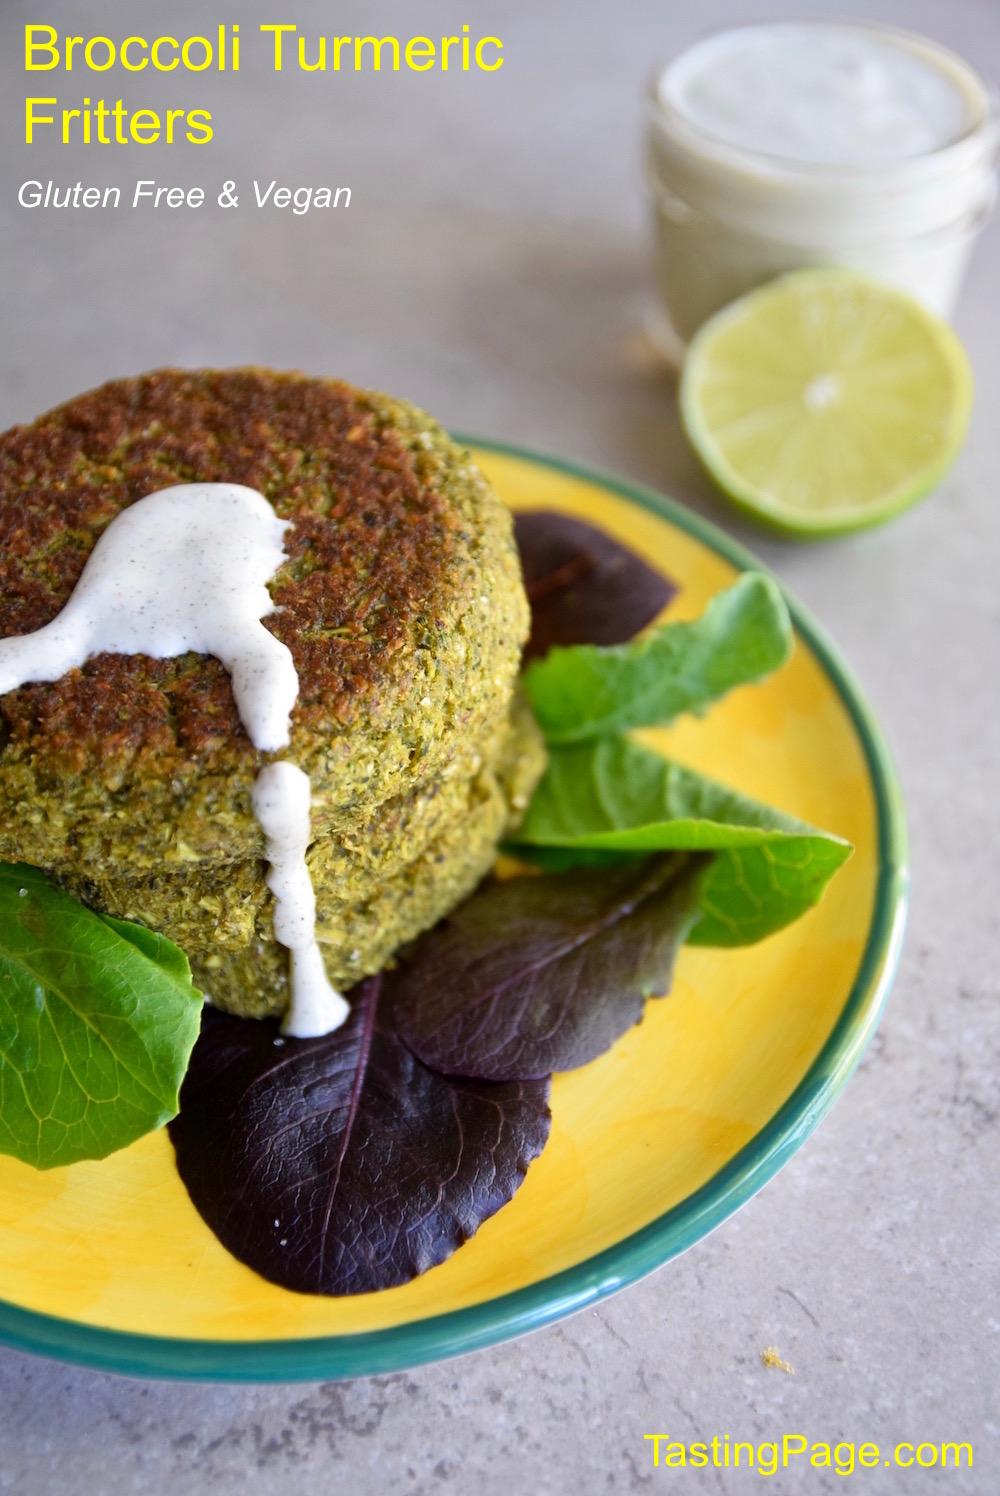 Broccoli Turmeric Fritters - gluten free and vegan   TastingPage.com